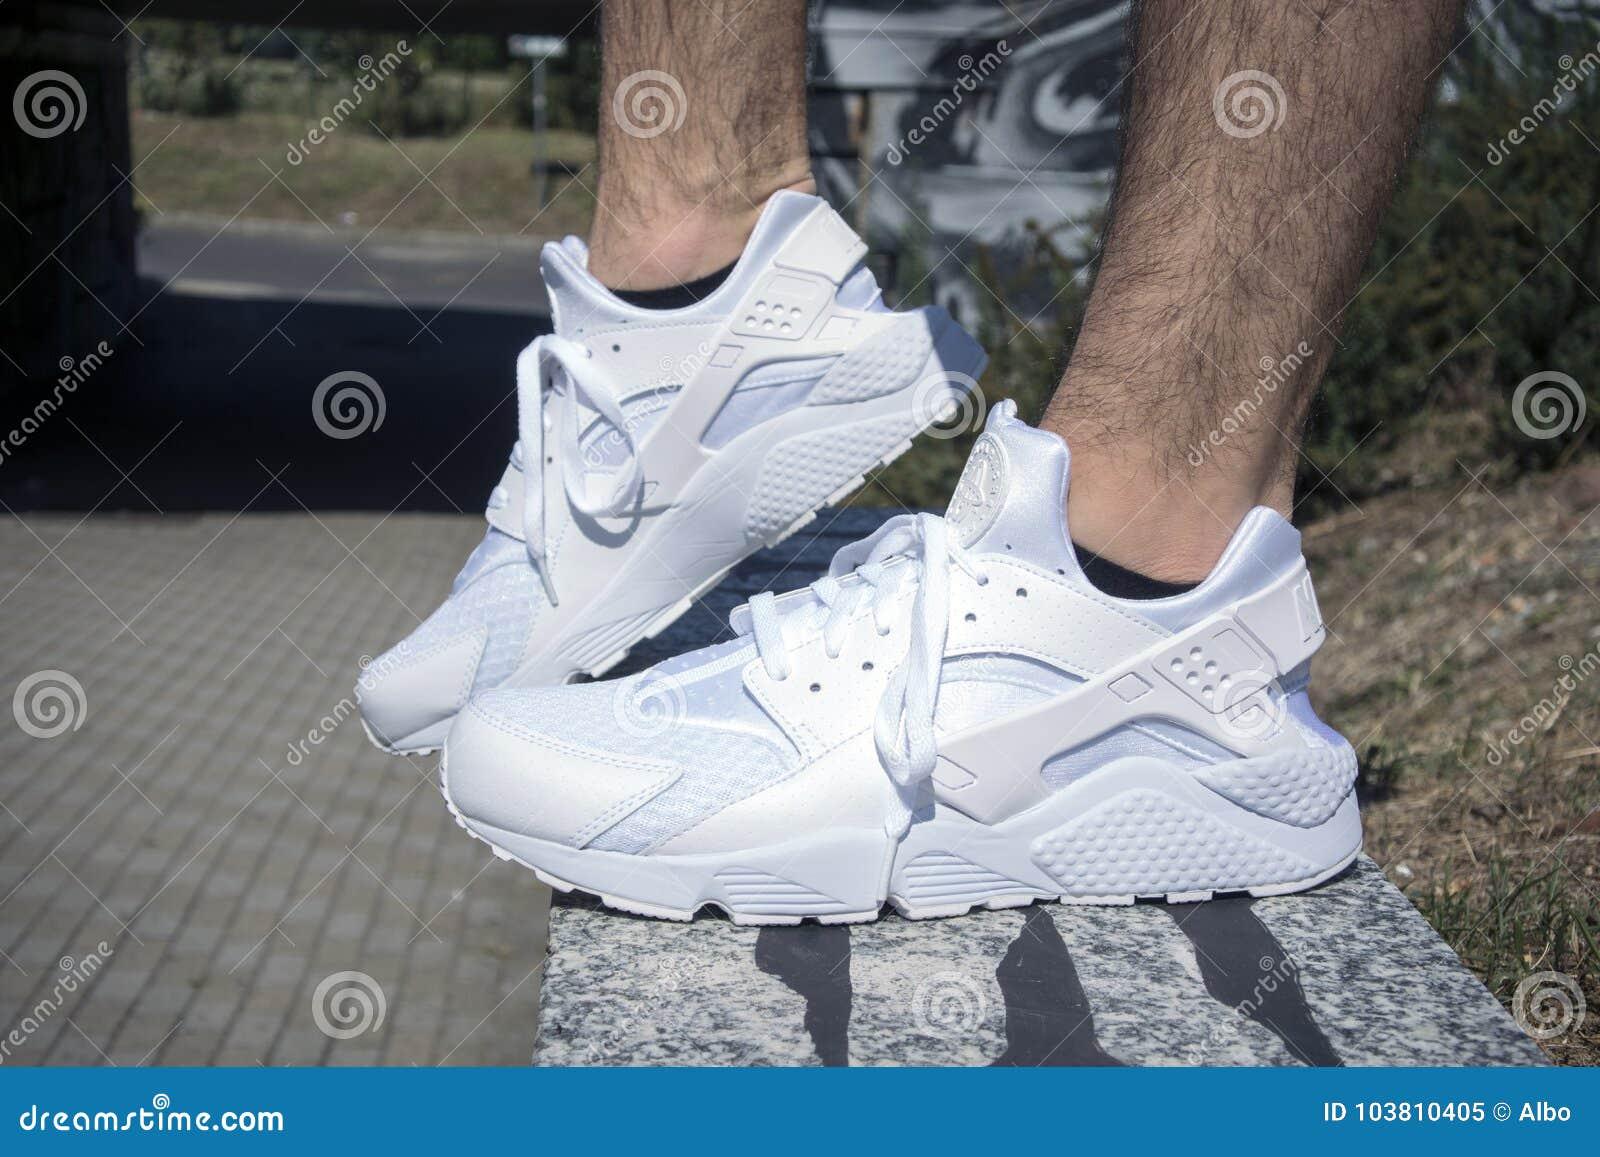 eae19be4b6c2 Nike Huarache εκδοτική εικόνα. εικόνα από μόδα